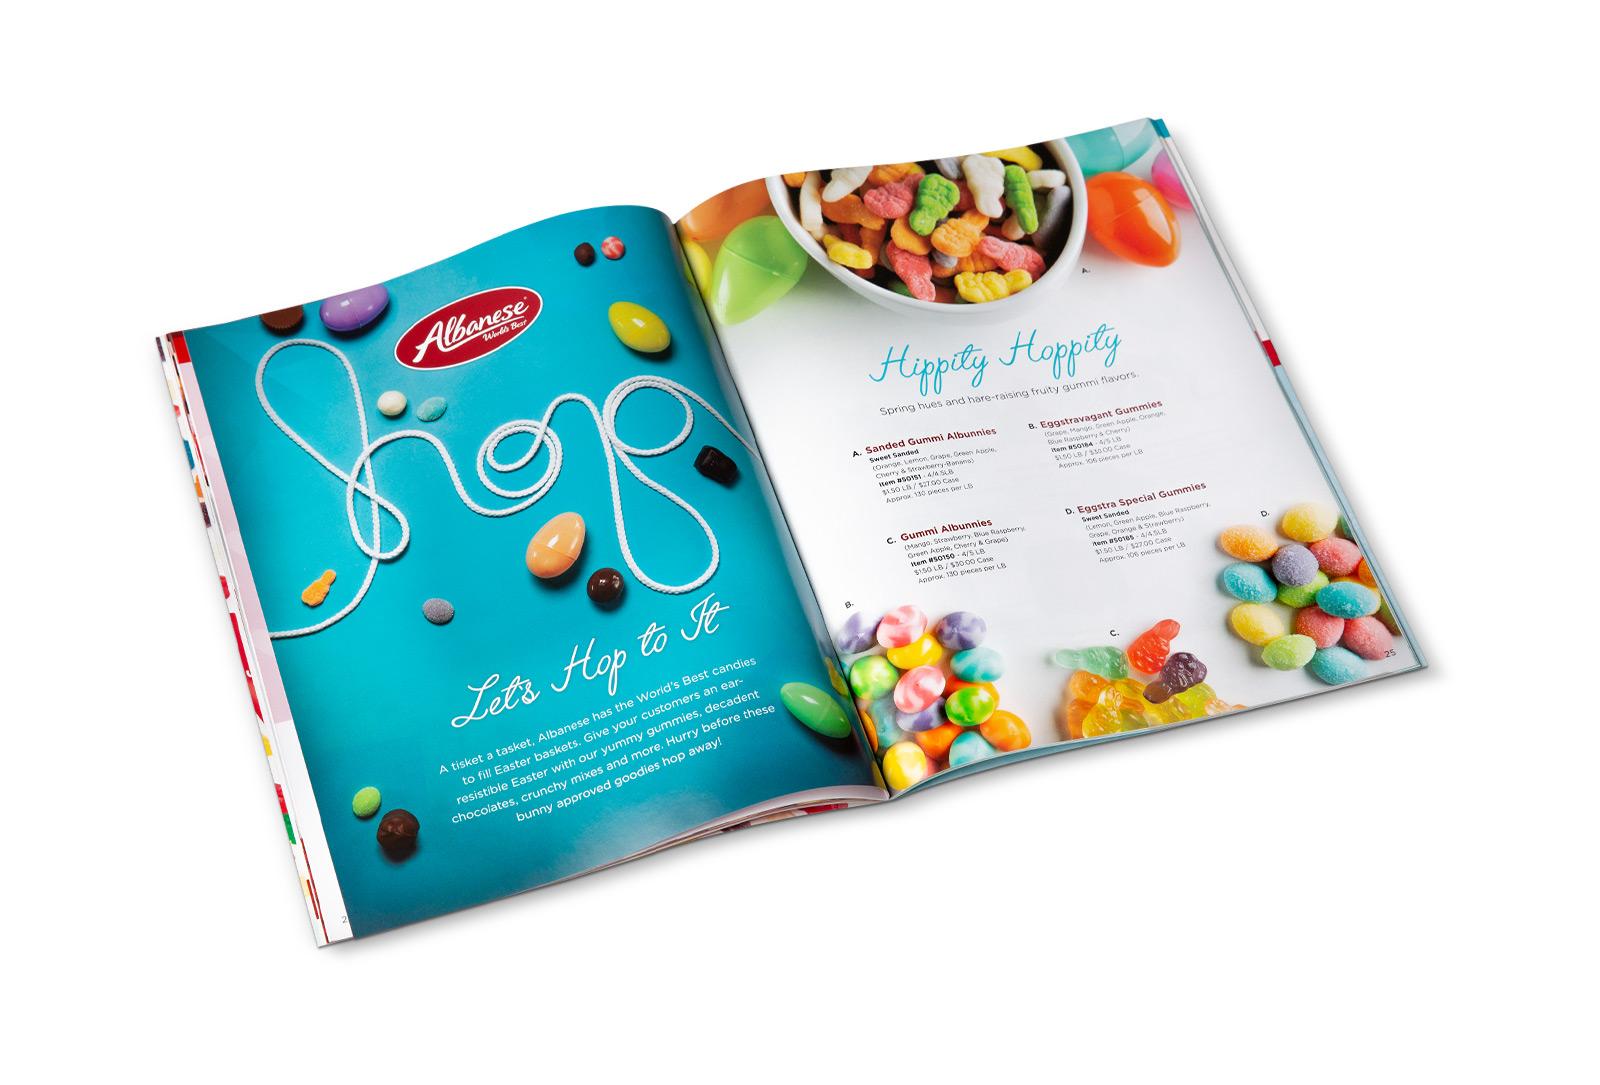 Albanese Easter confectionary treats catalog spread design